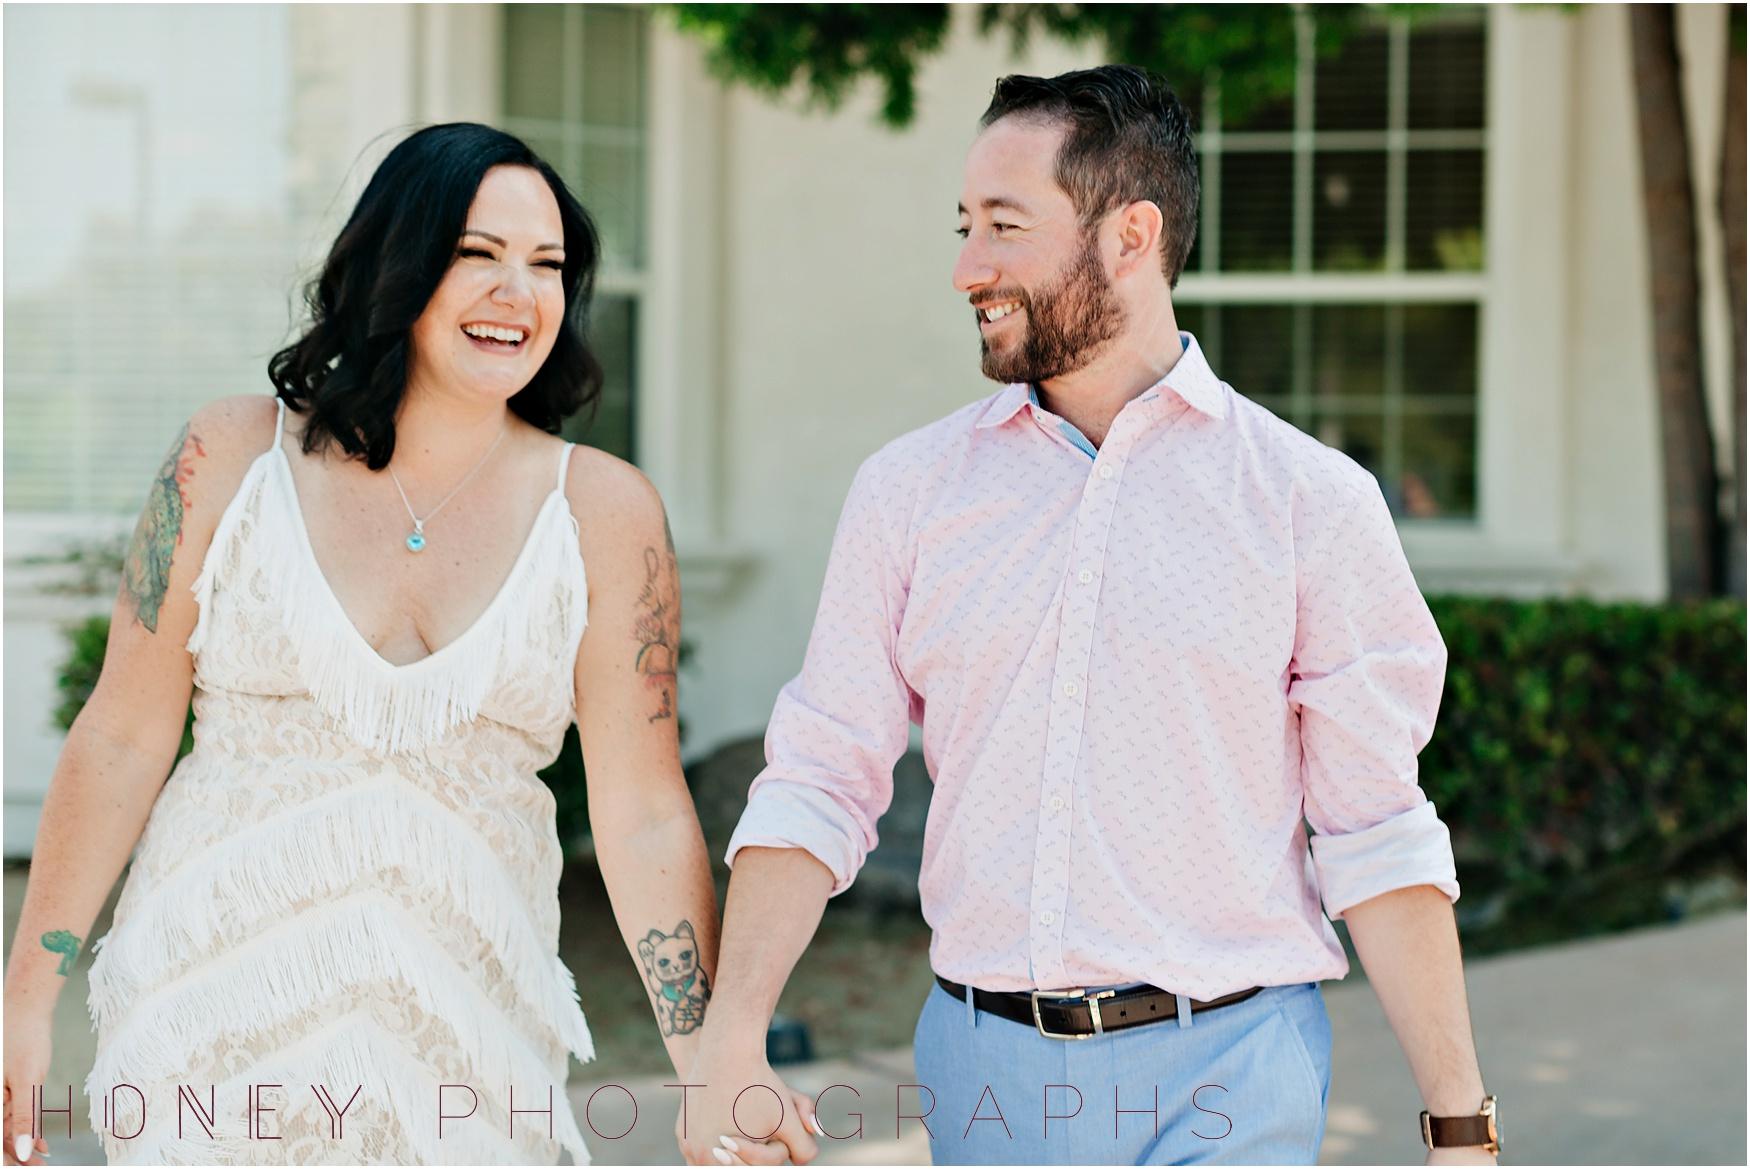 colorful_ecclectic_vibrant_vista_rainbow_quirky_wedding061.jpg